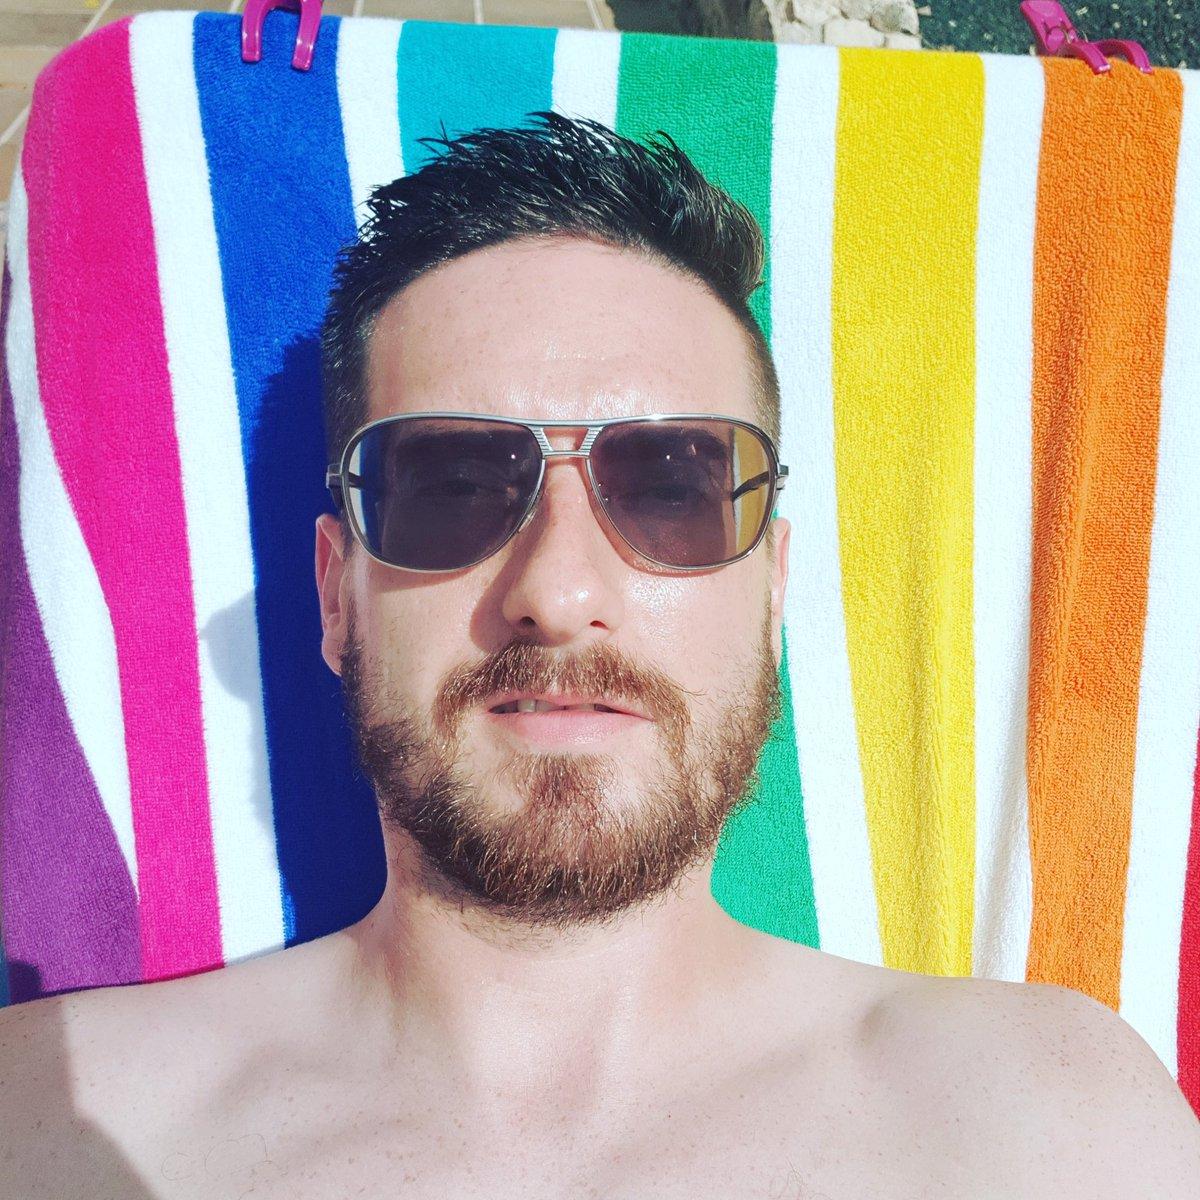 Sunday chill times  #holiday #sunshine #sunny #sunbathıng #pool #poolside #shades #policeshades #sunglasses #holidaystyle #gotsunsprayinmymouth #fuerteventura #canaryislands #sundaychills #chillax #relaxing #beard #beardsofinstagram #guyswithbeards #beards #beardinthesun #summer https://t.co/6ubG27uJgw